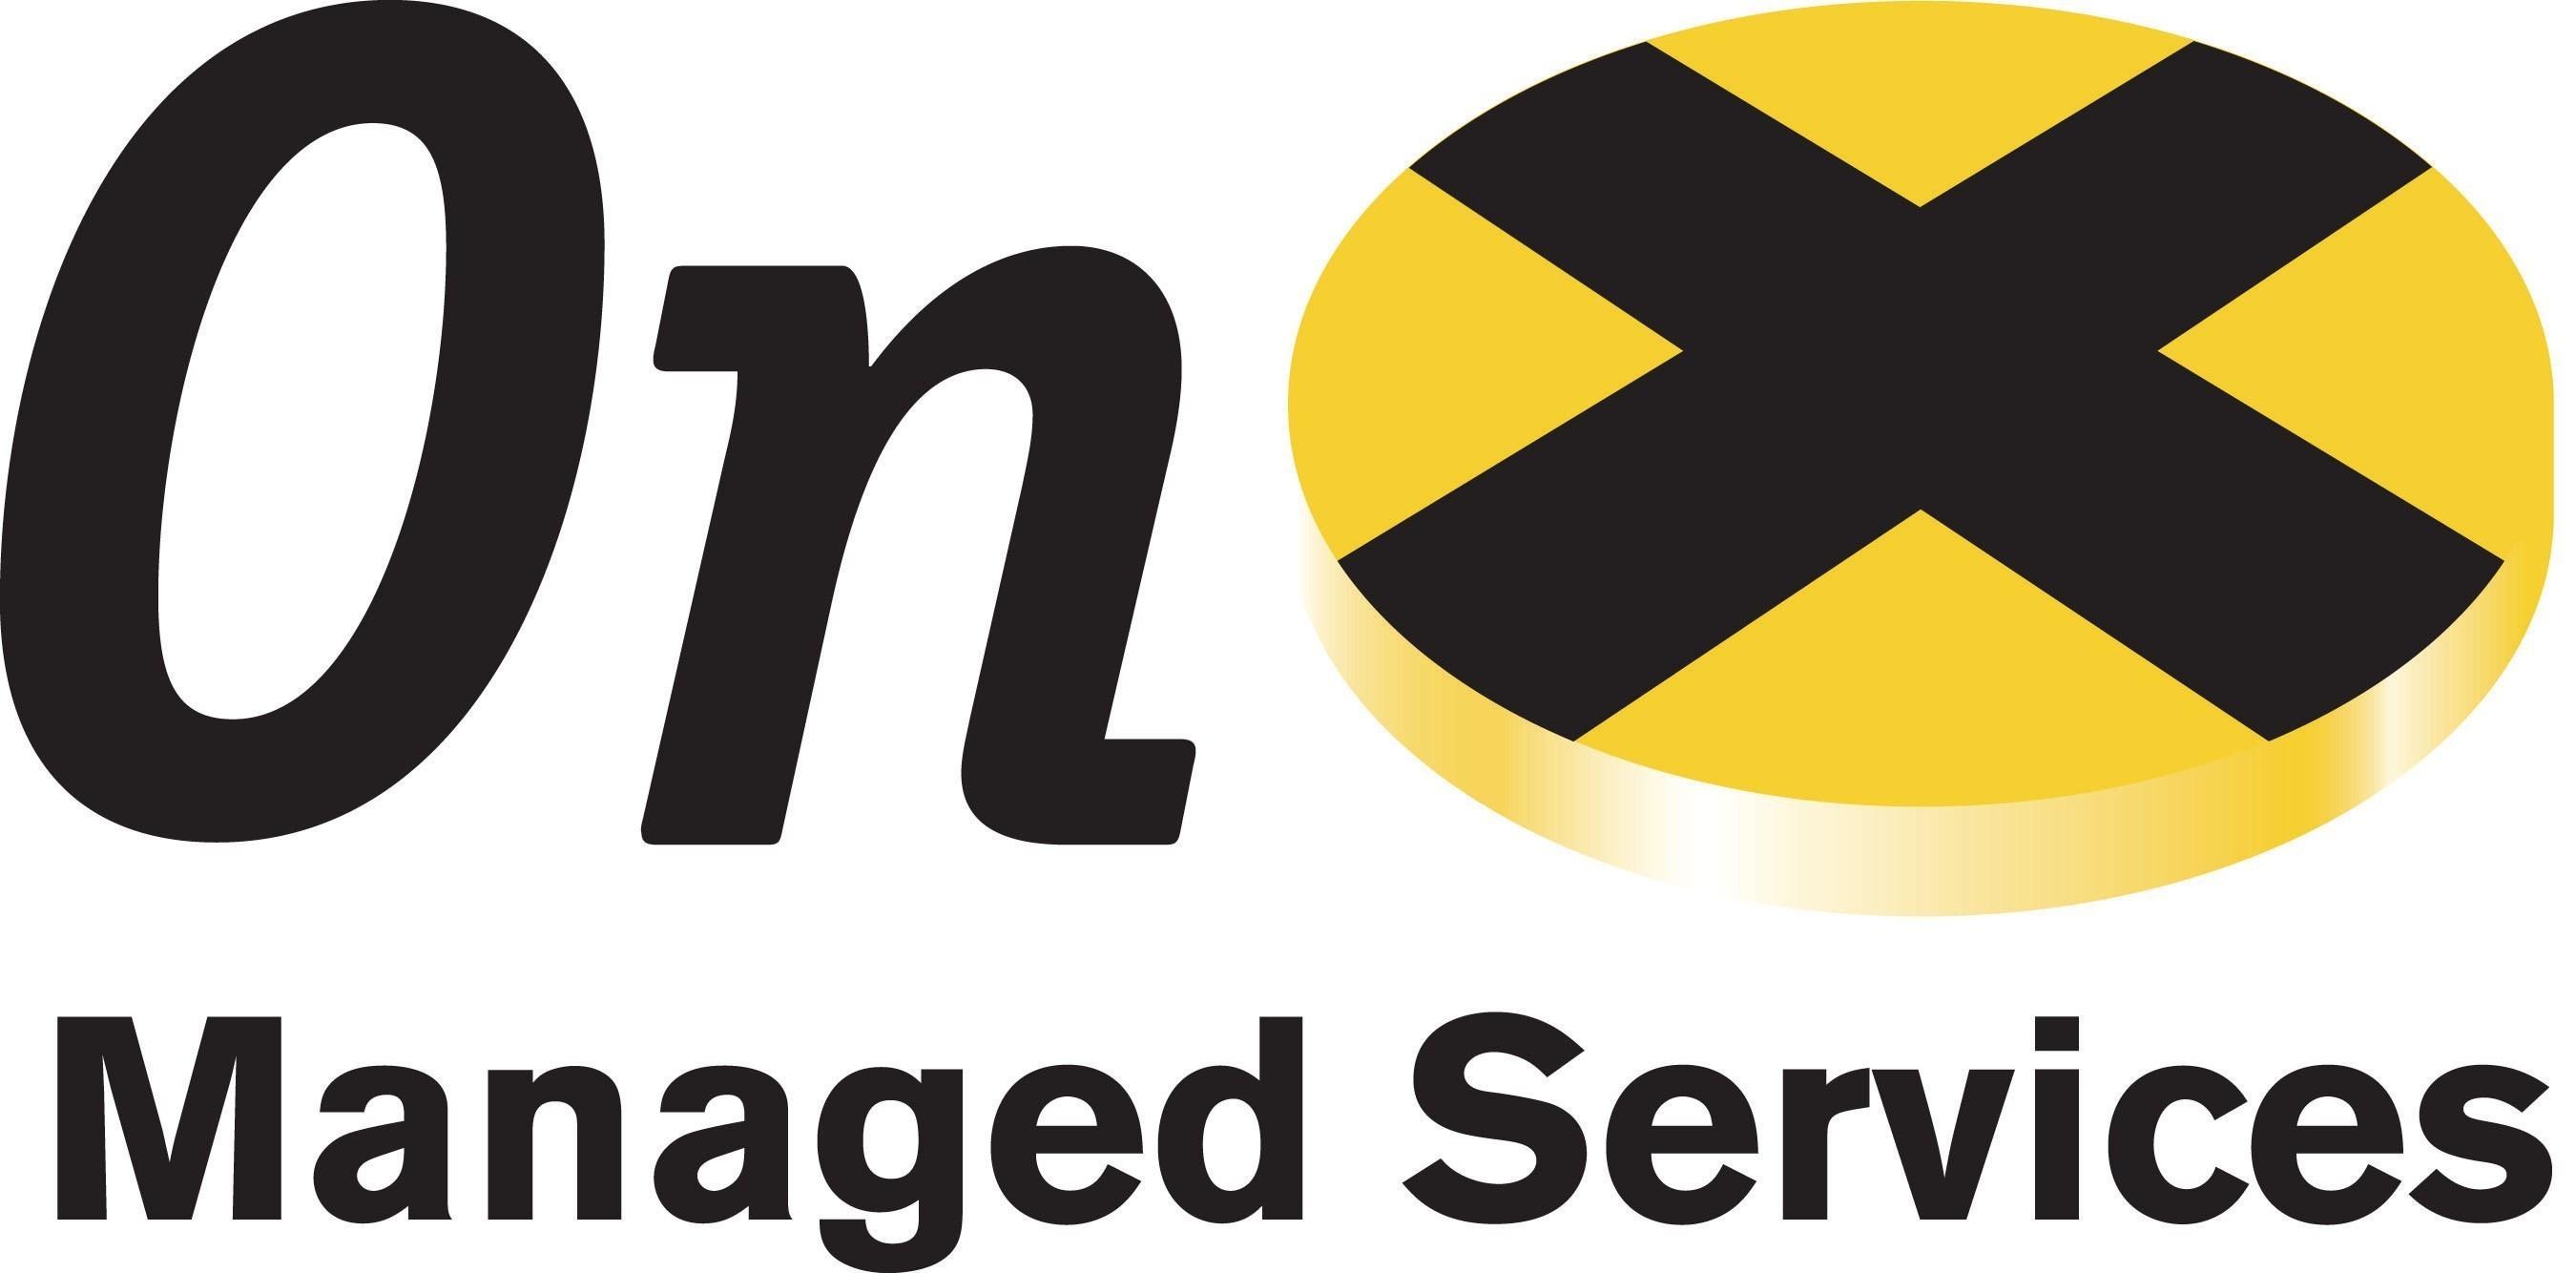 OnX Managed Services Logo (PRNewsFoto/OnX Enterprise Solutions)